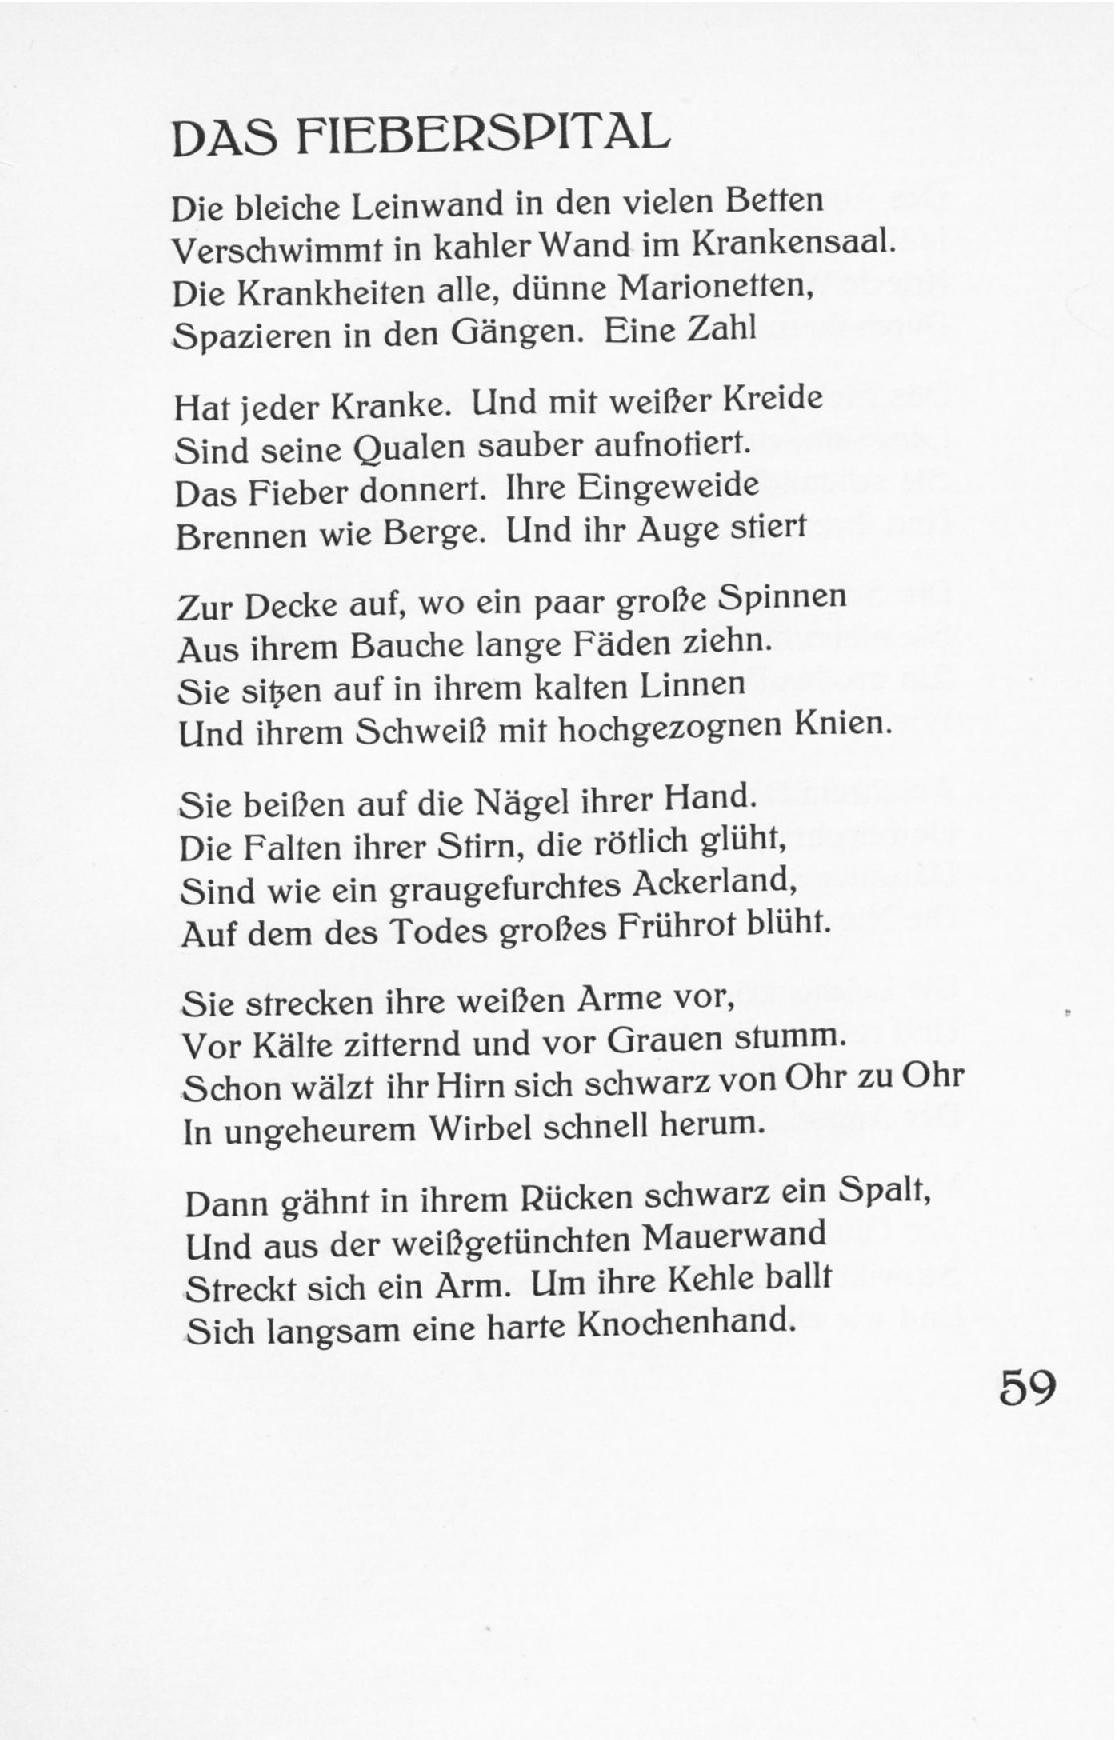 File:Der ewige Tag 59.jpg - Wikimedia Commons